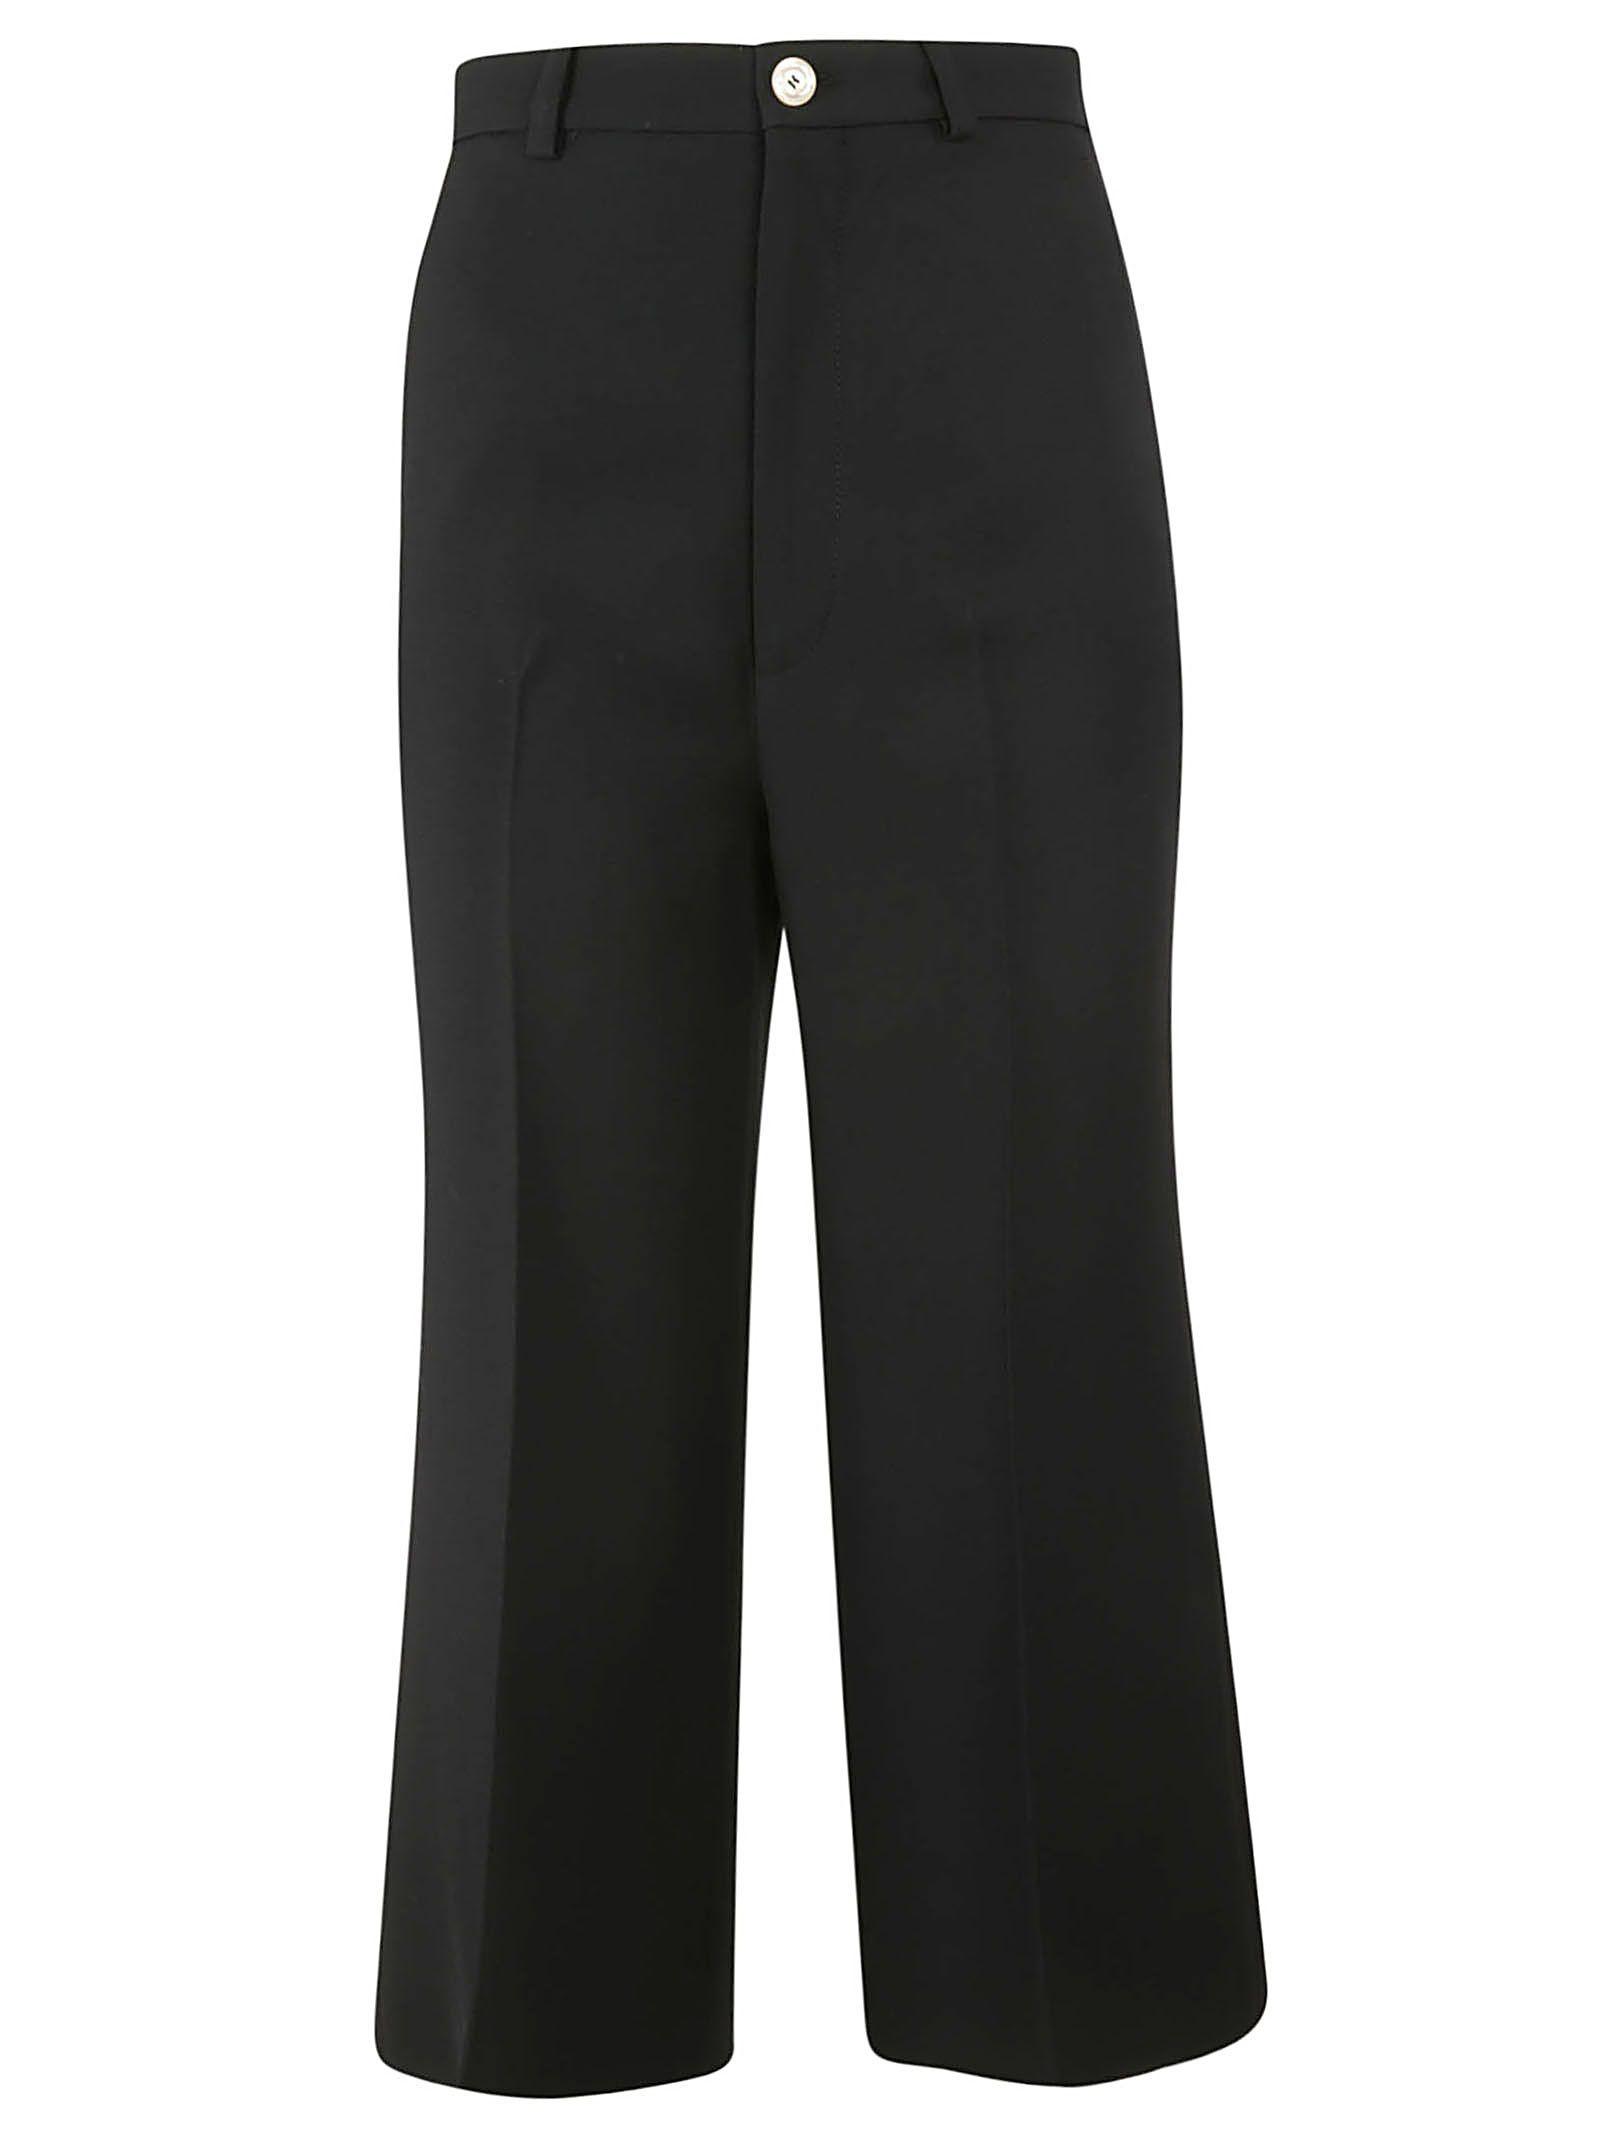 Gucci High Waist Trousers